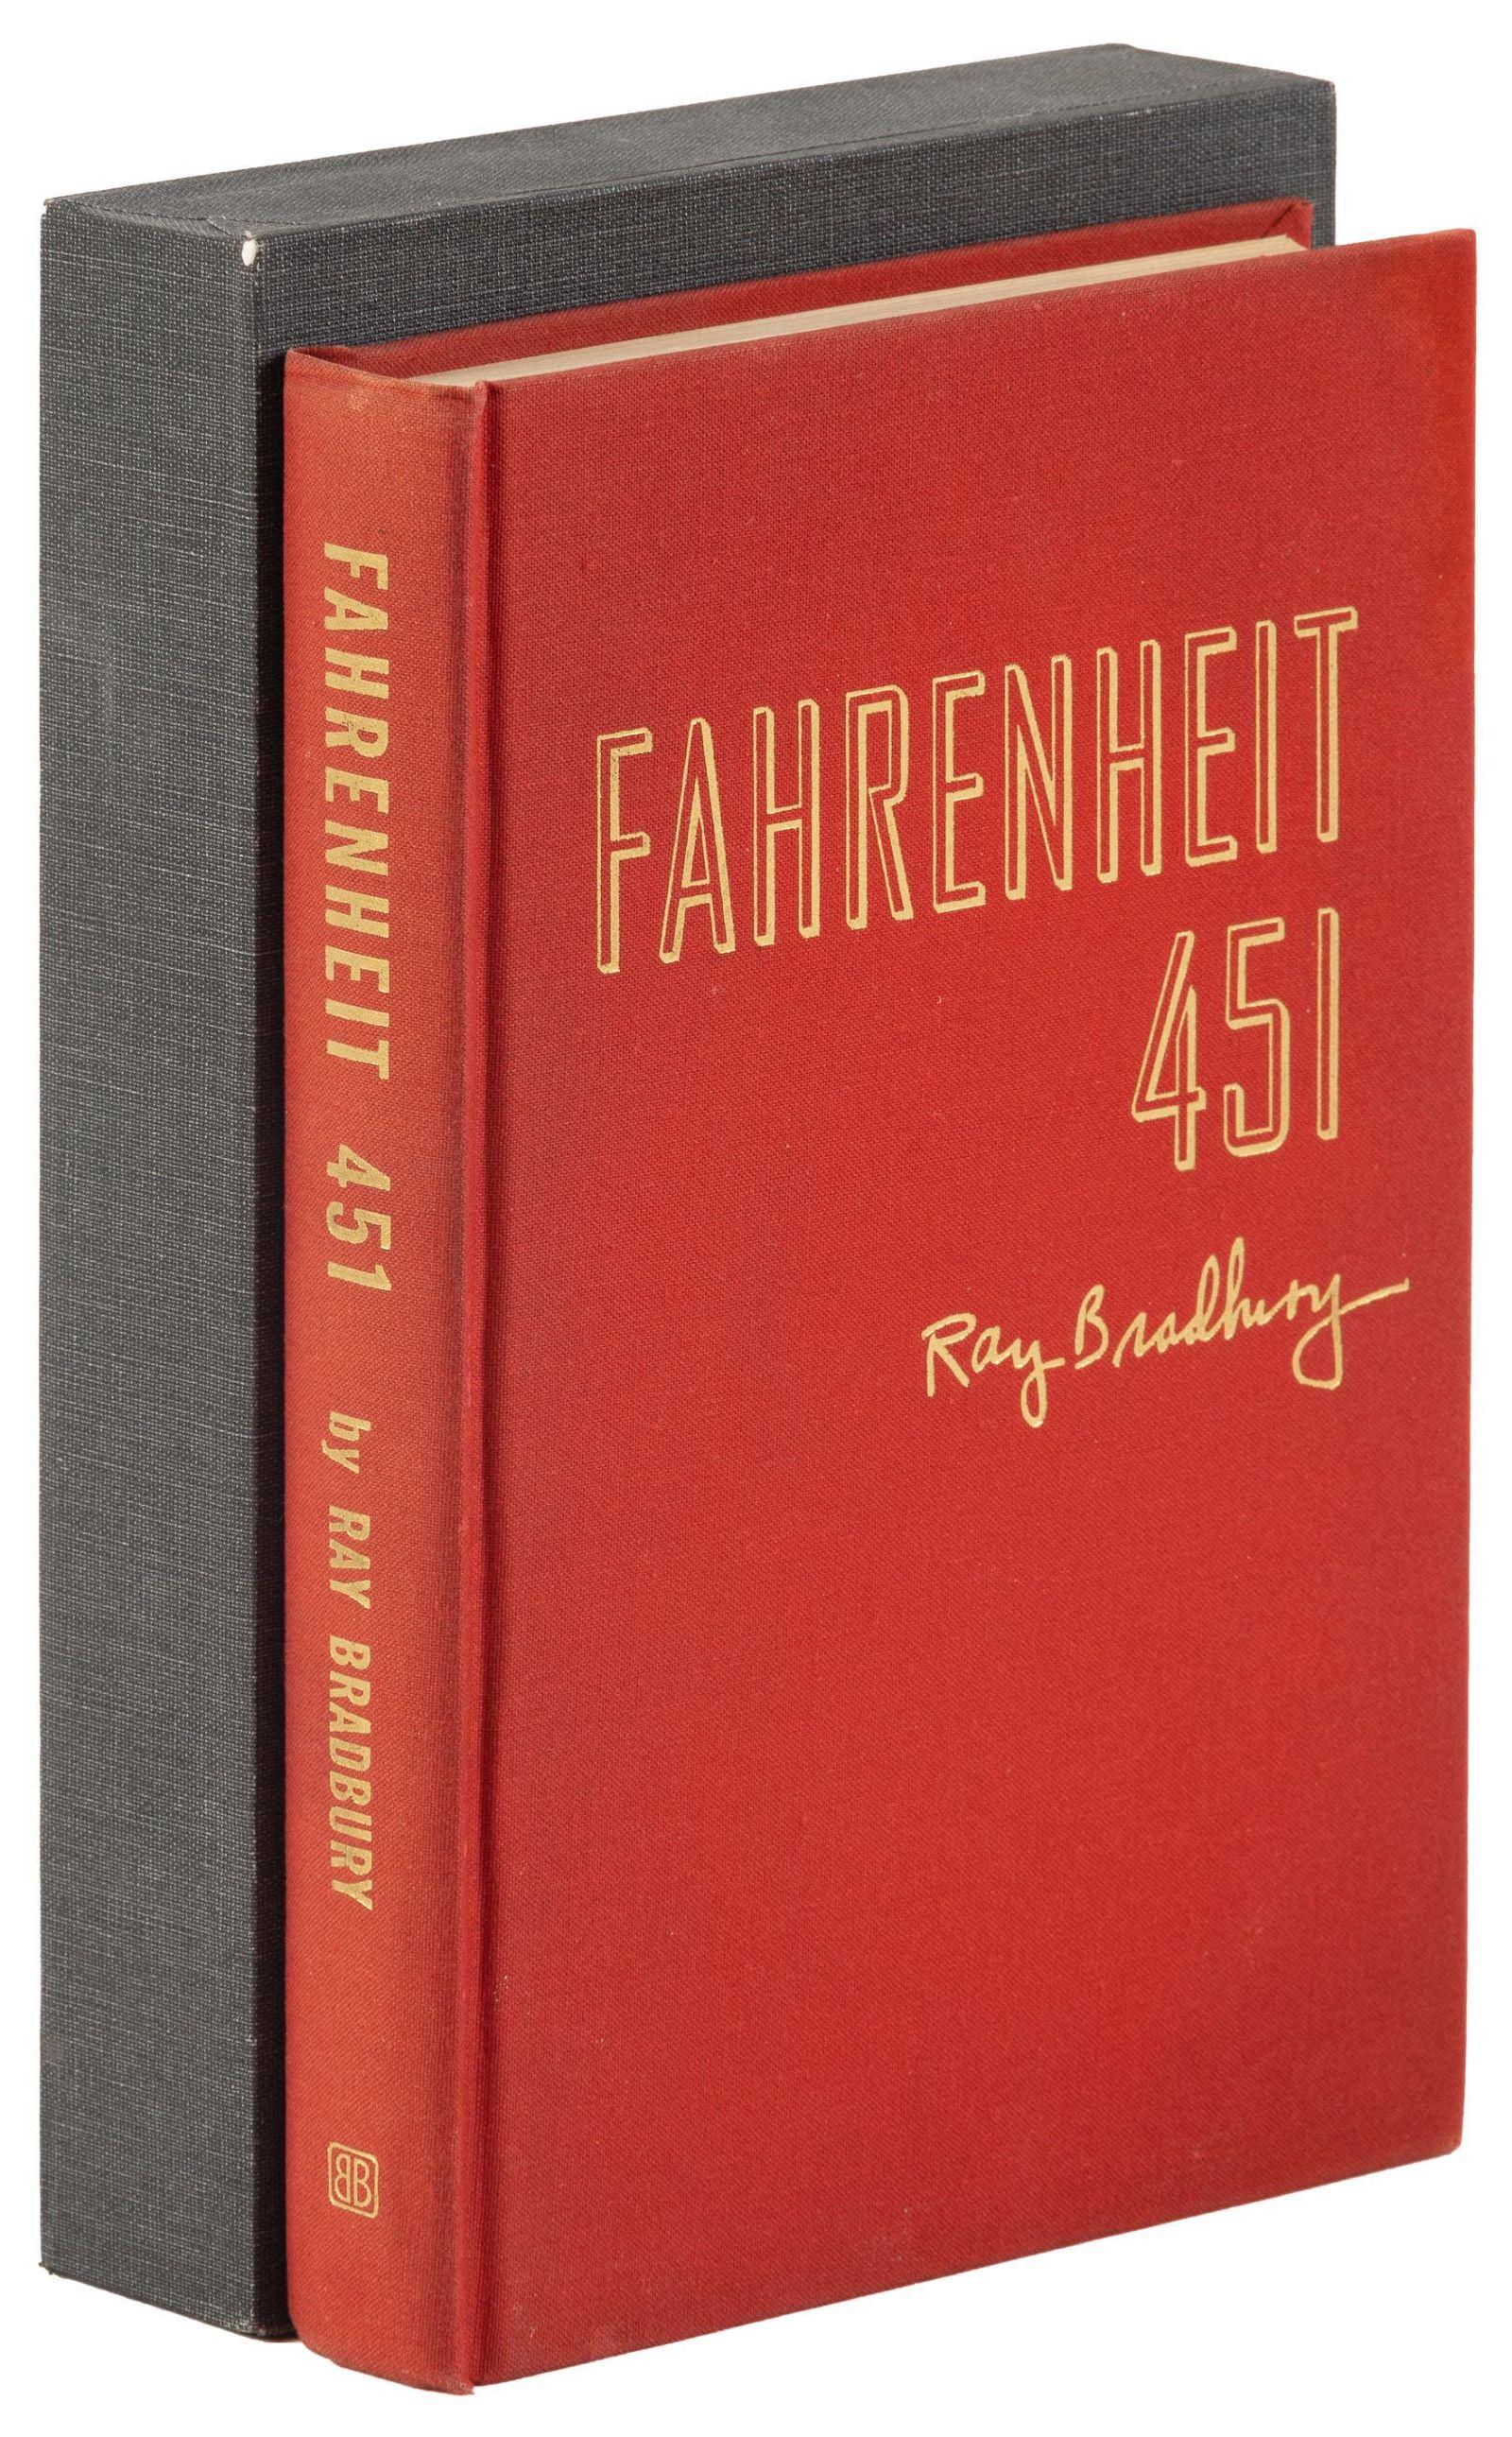 Rare presentation copy of F. 451, inscribed